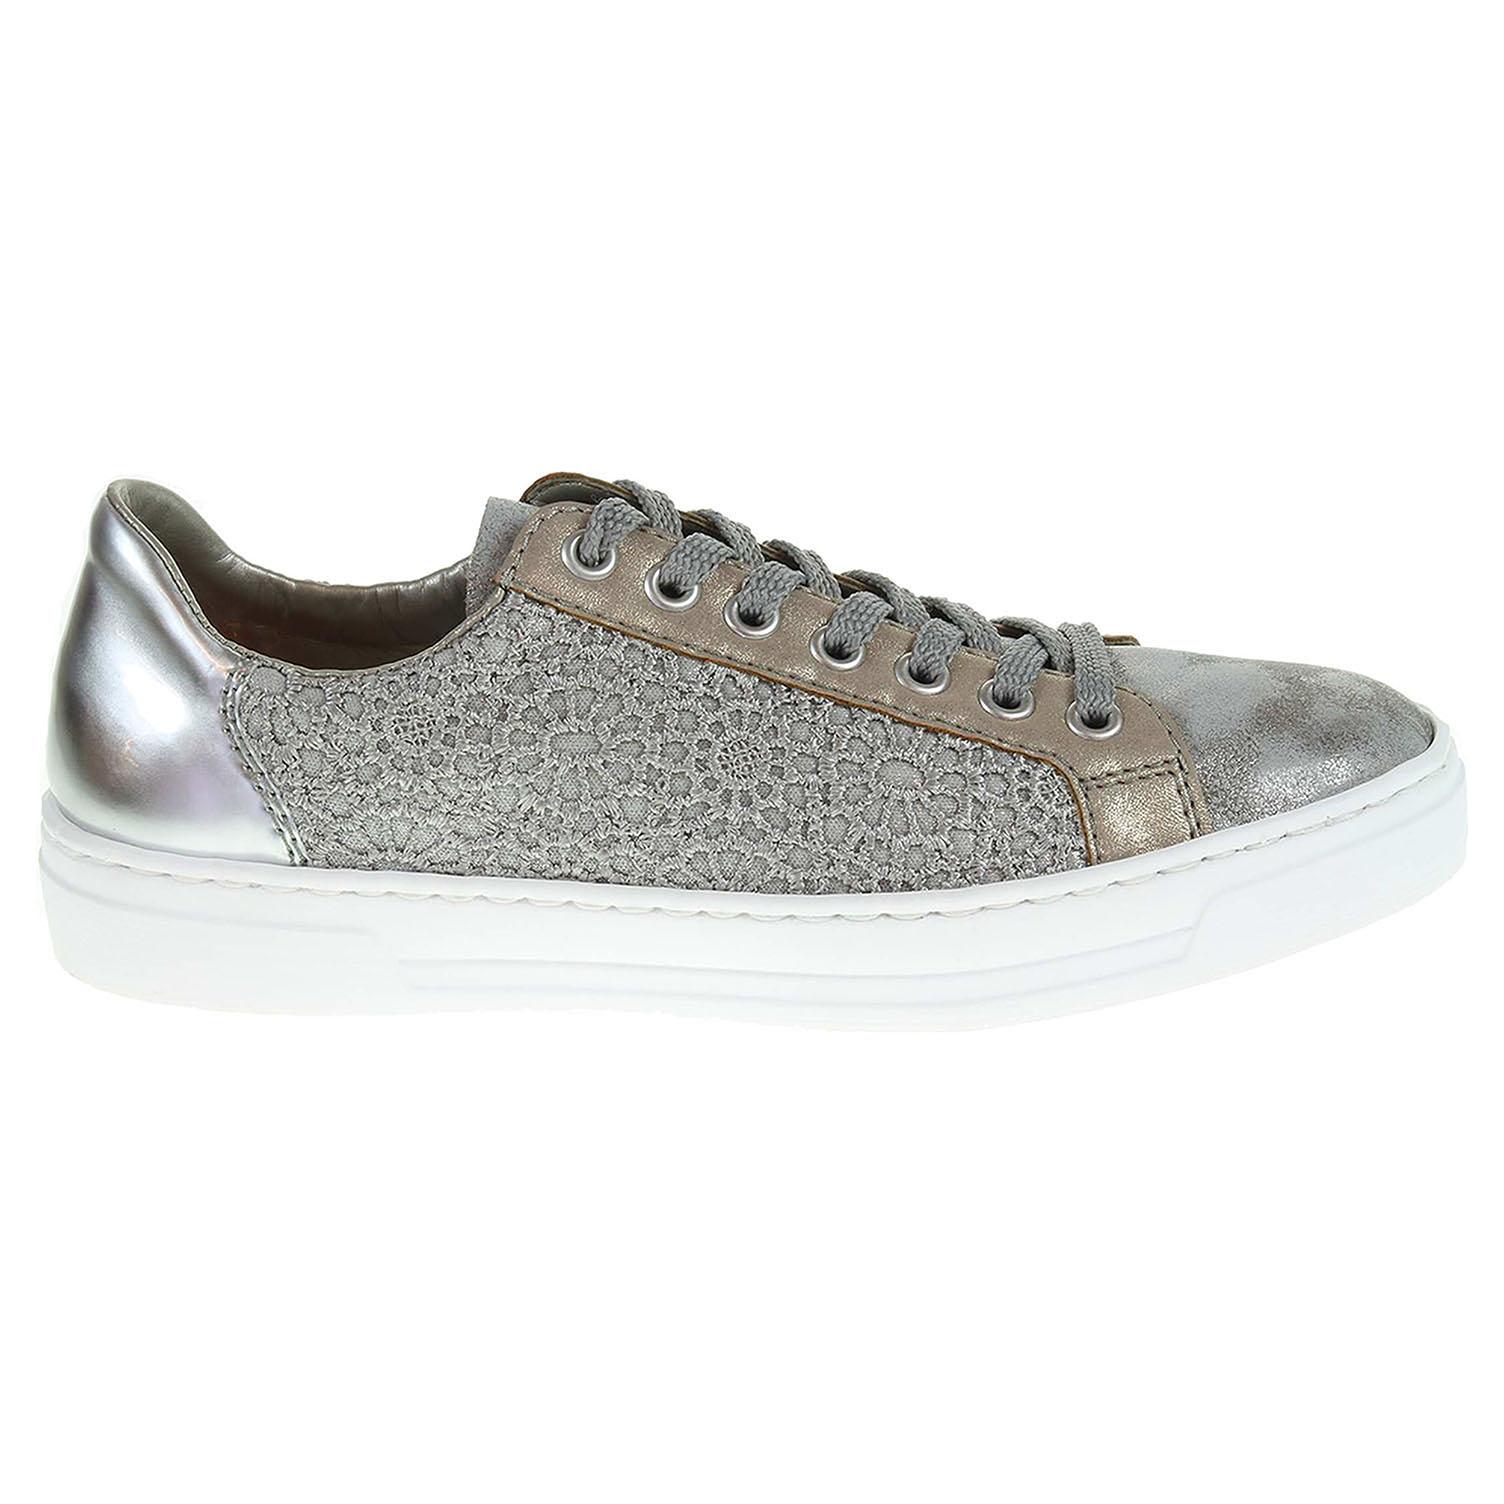 Rieker dámská obuv L8514-41 šedá 41